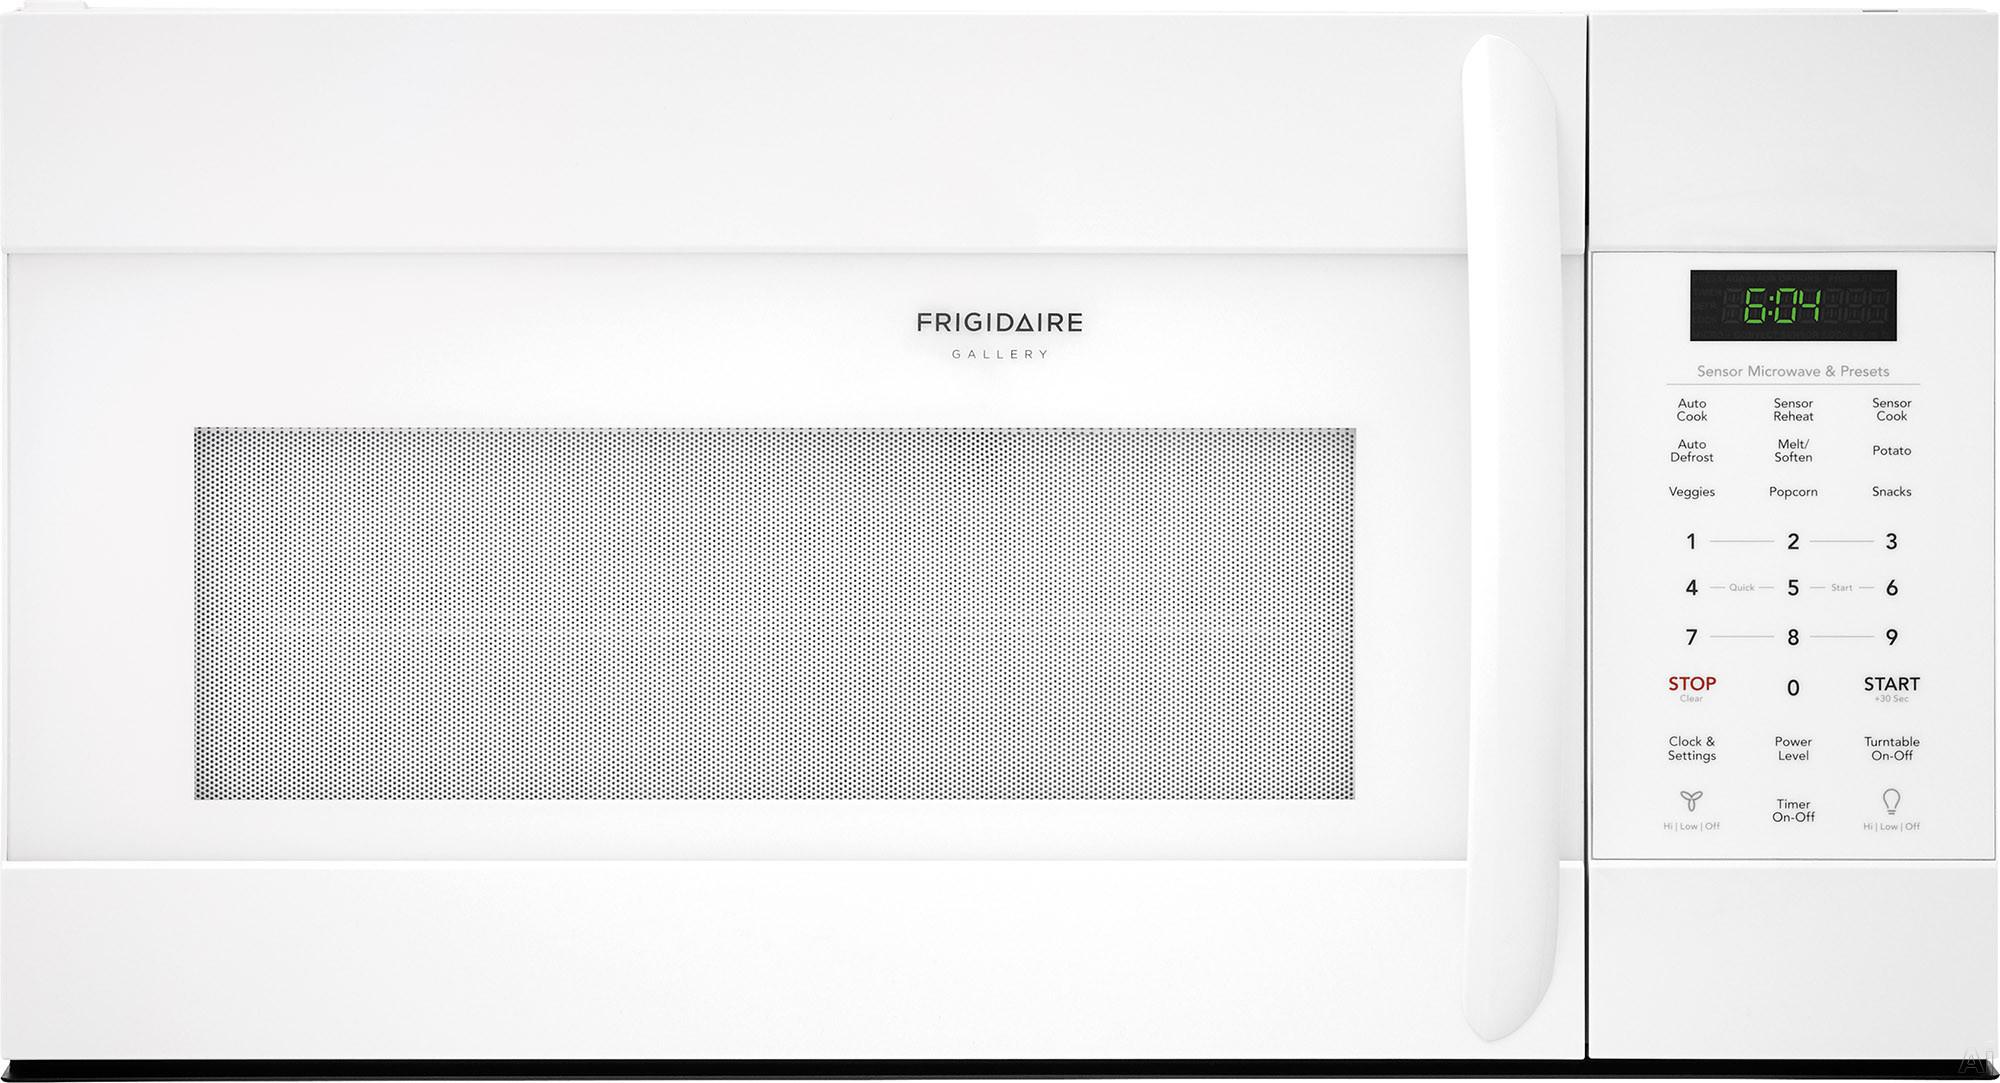 Frigidaire Gallery Series FGMV176NTW 30 Inch Over the Range Microwave with Sensor Cooking, SpaceWise® Rack, PureAir® Microwave Filter, Effortless Clean™ Interior, Effortless™ Reheat,